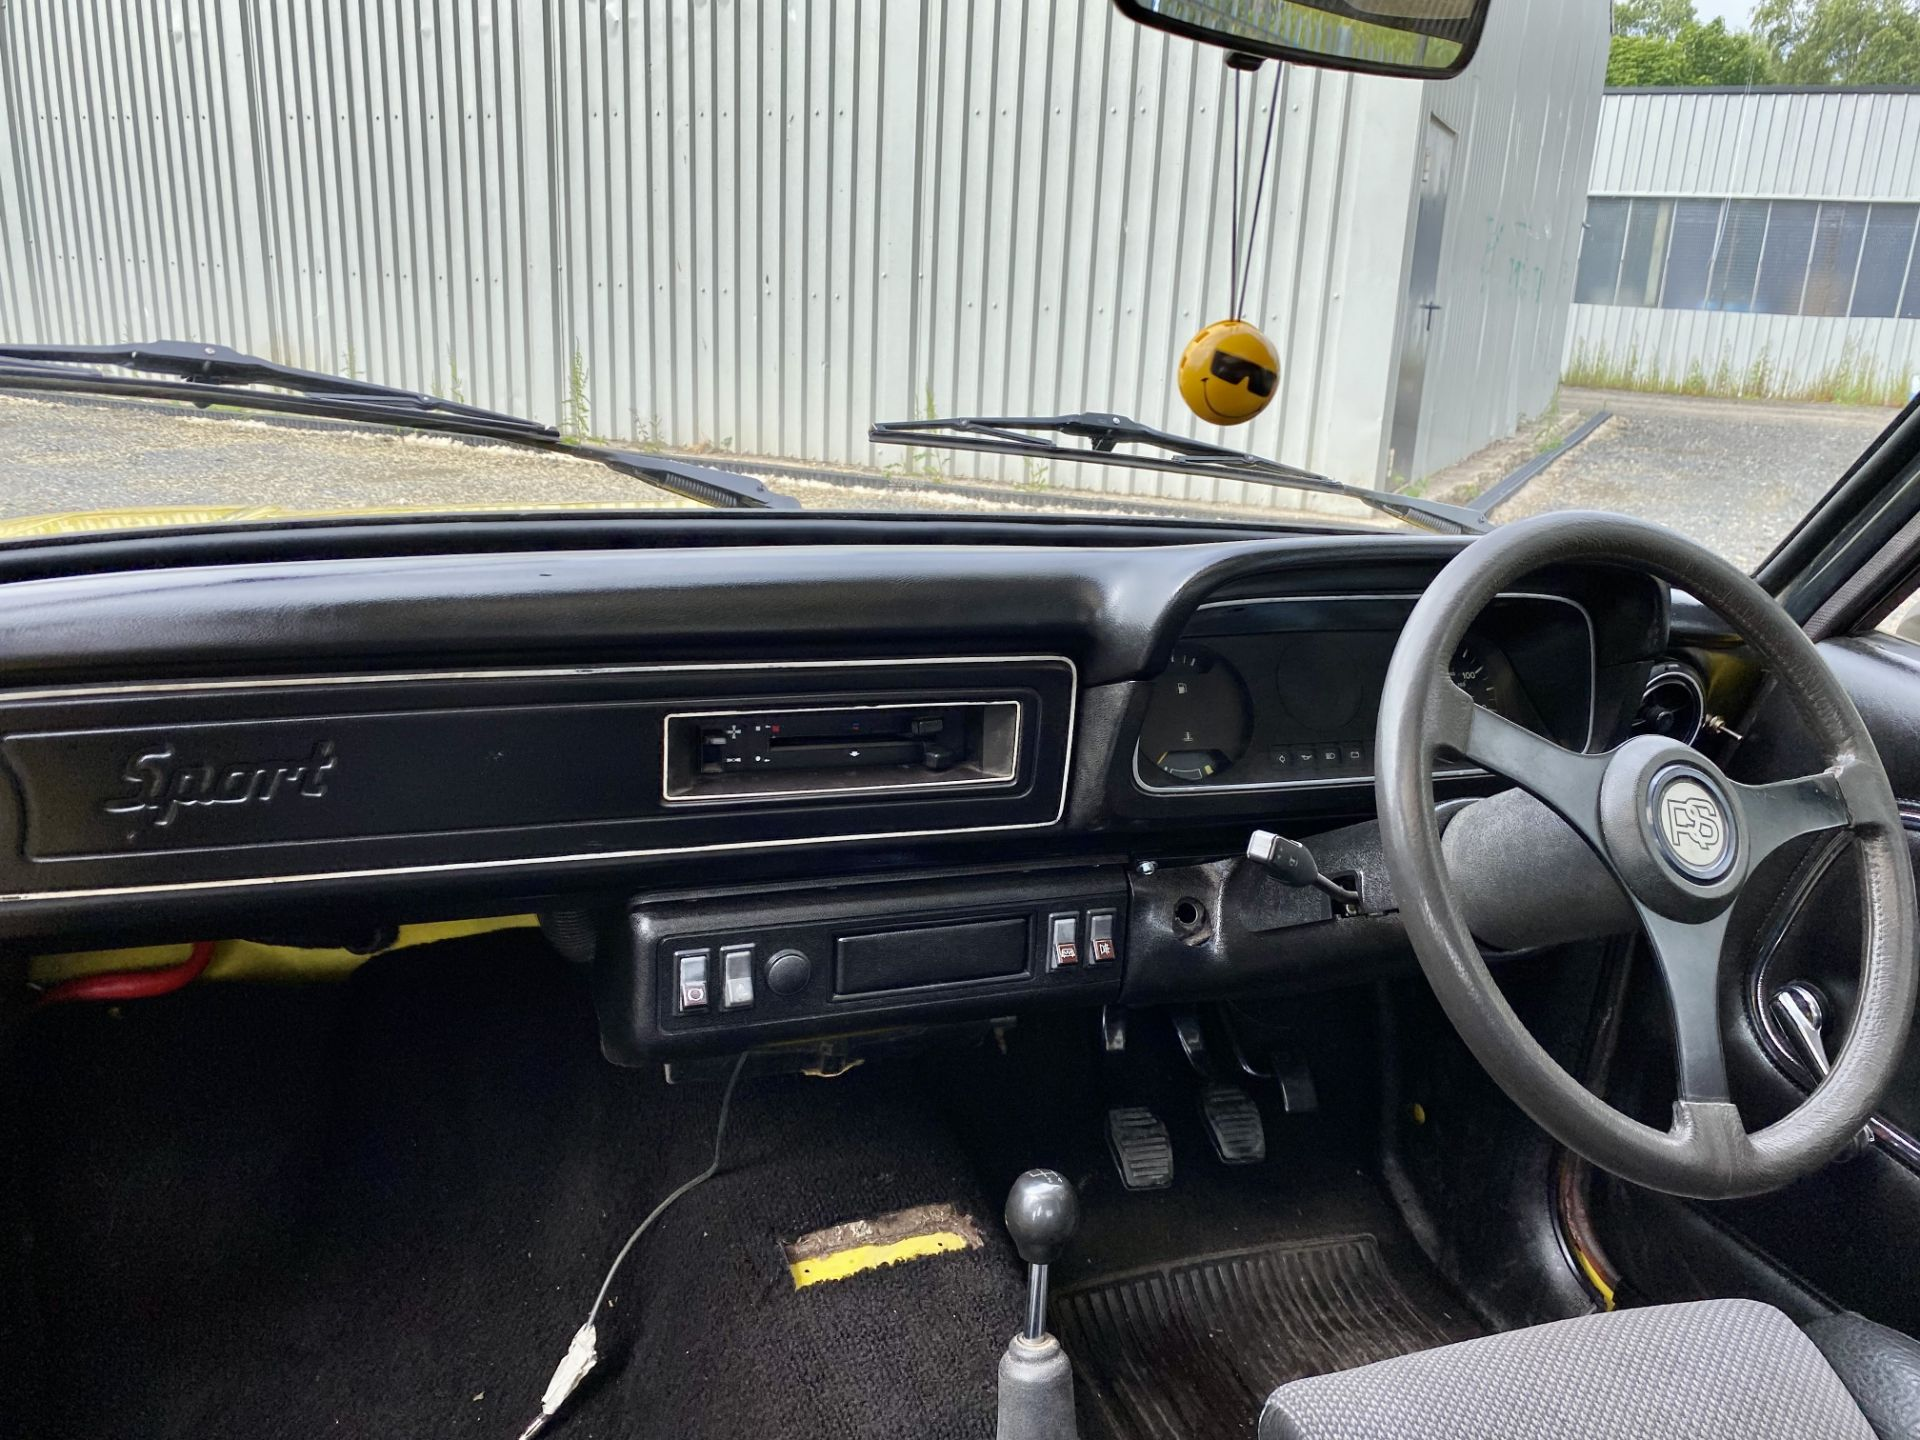 Ford Escort MK2 - Image 45 of 58